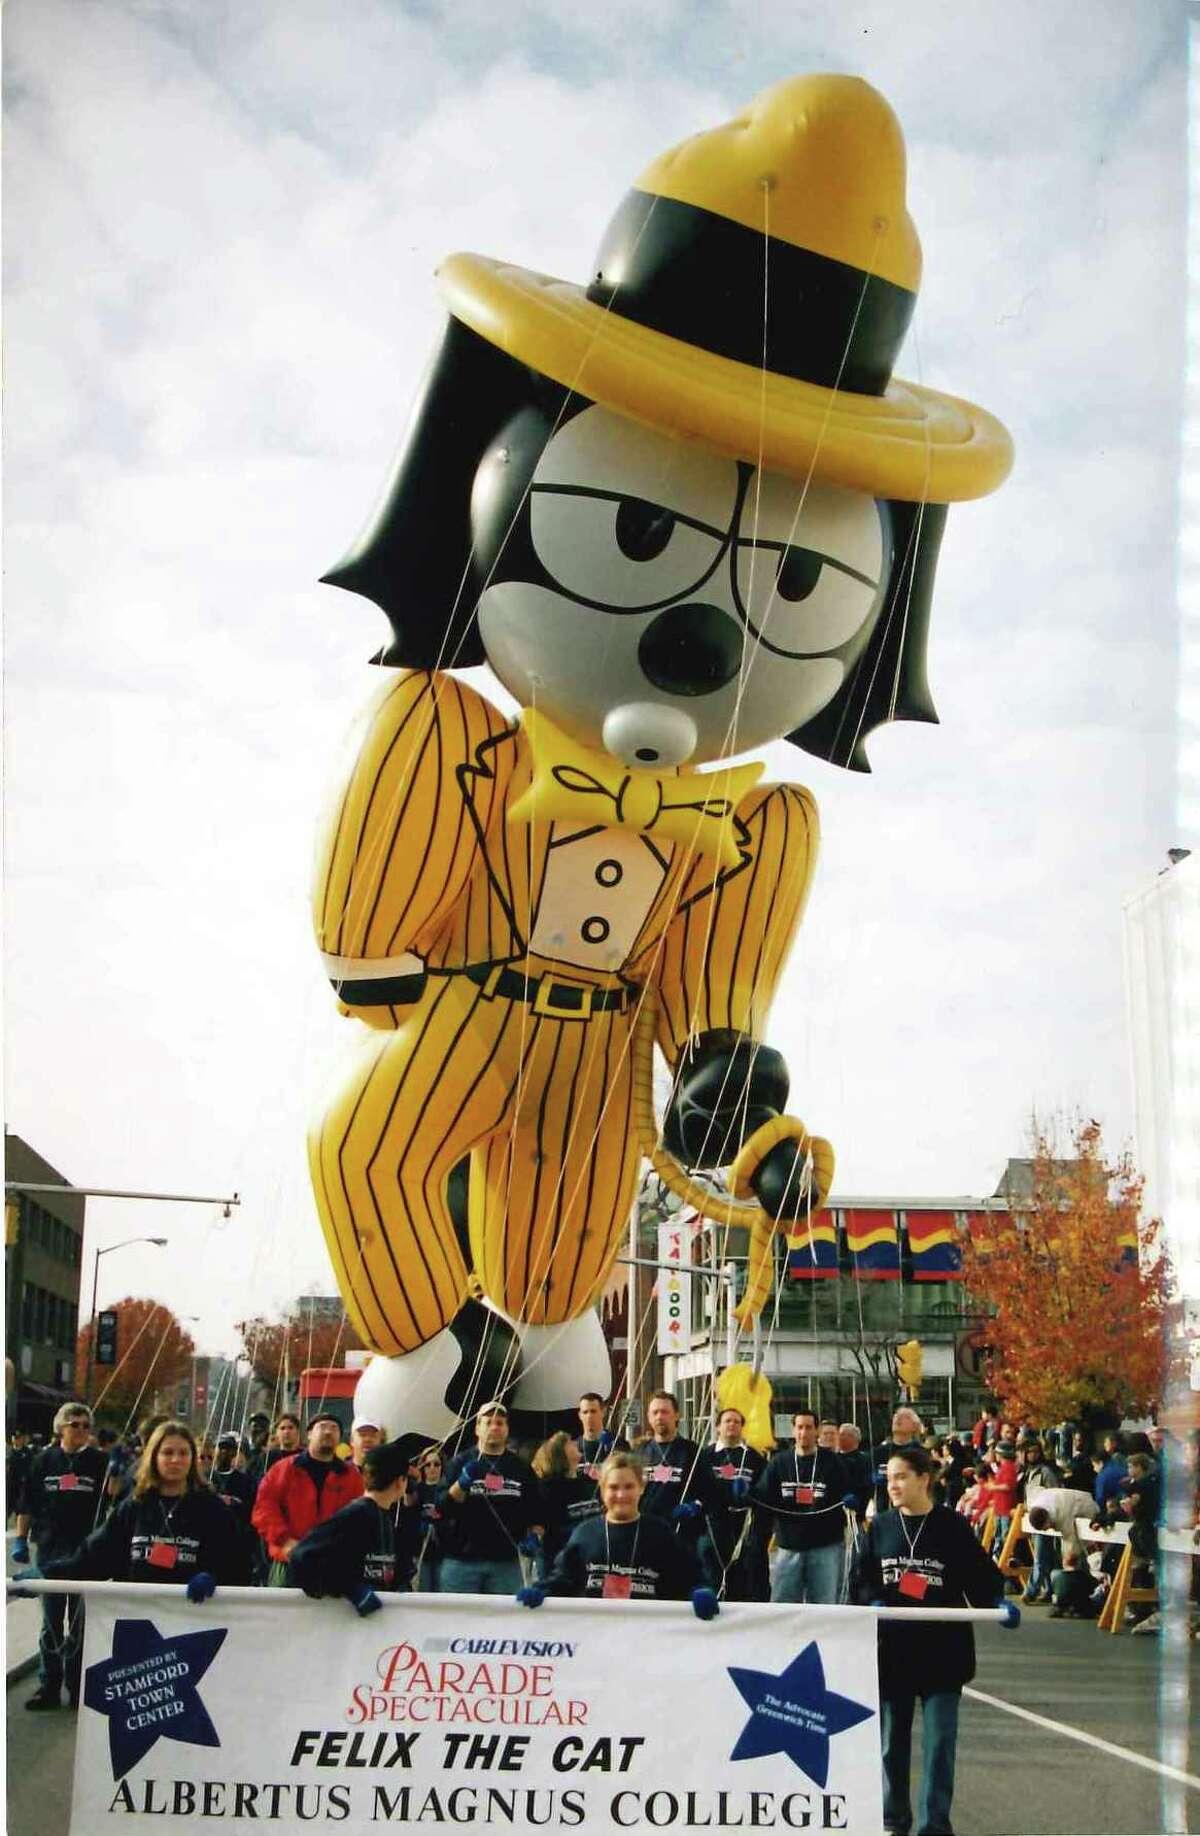 Stamford parade spectacular 2014